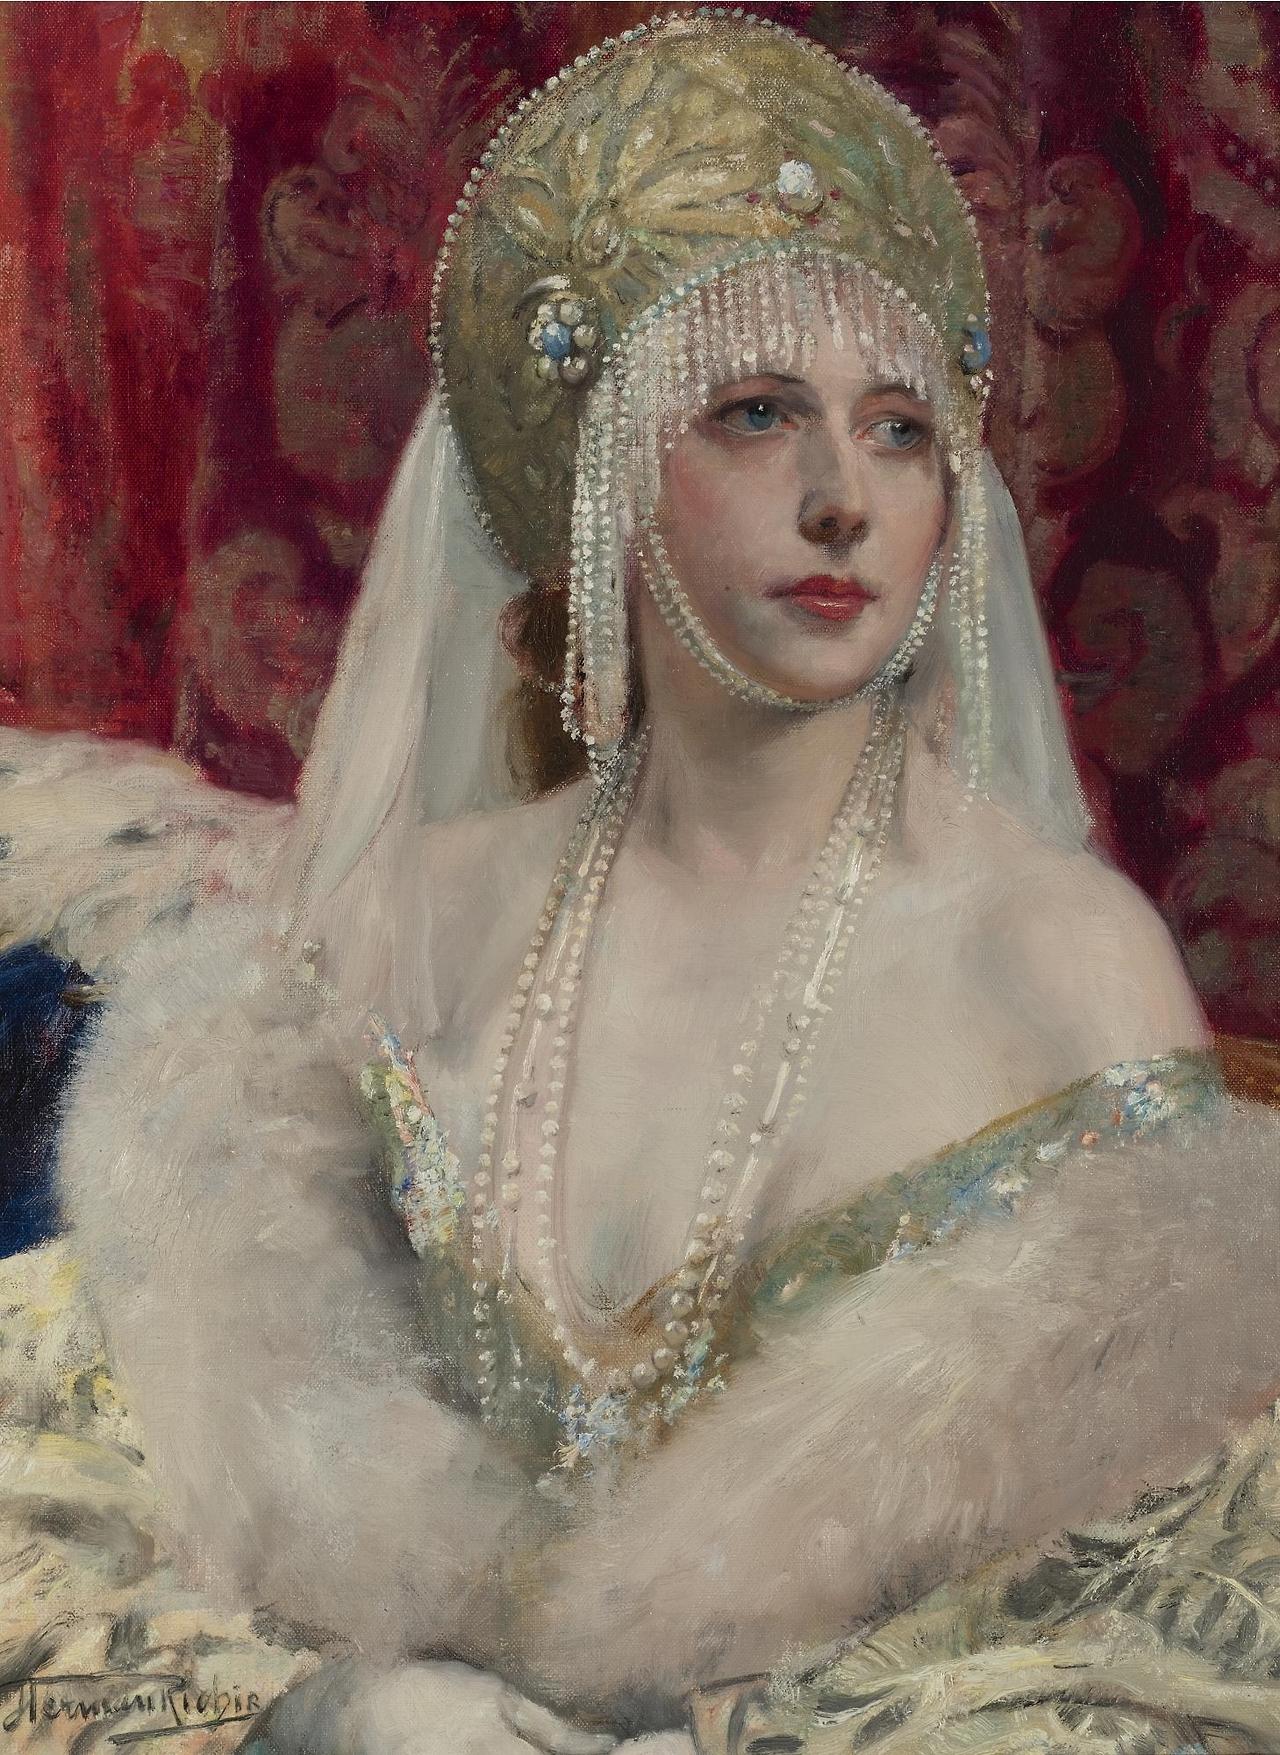 Snow Fairy (1918), Herman Jean Joseph Richir (Belgian 1866-1942)